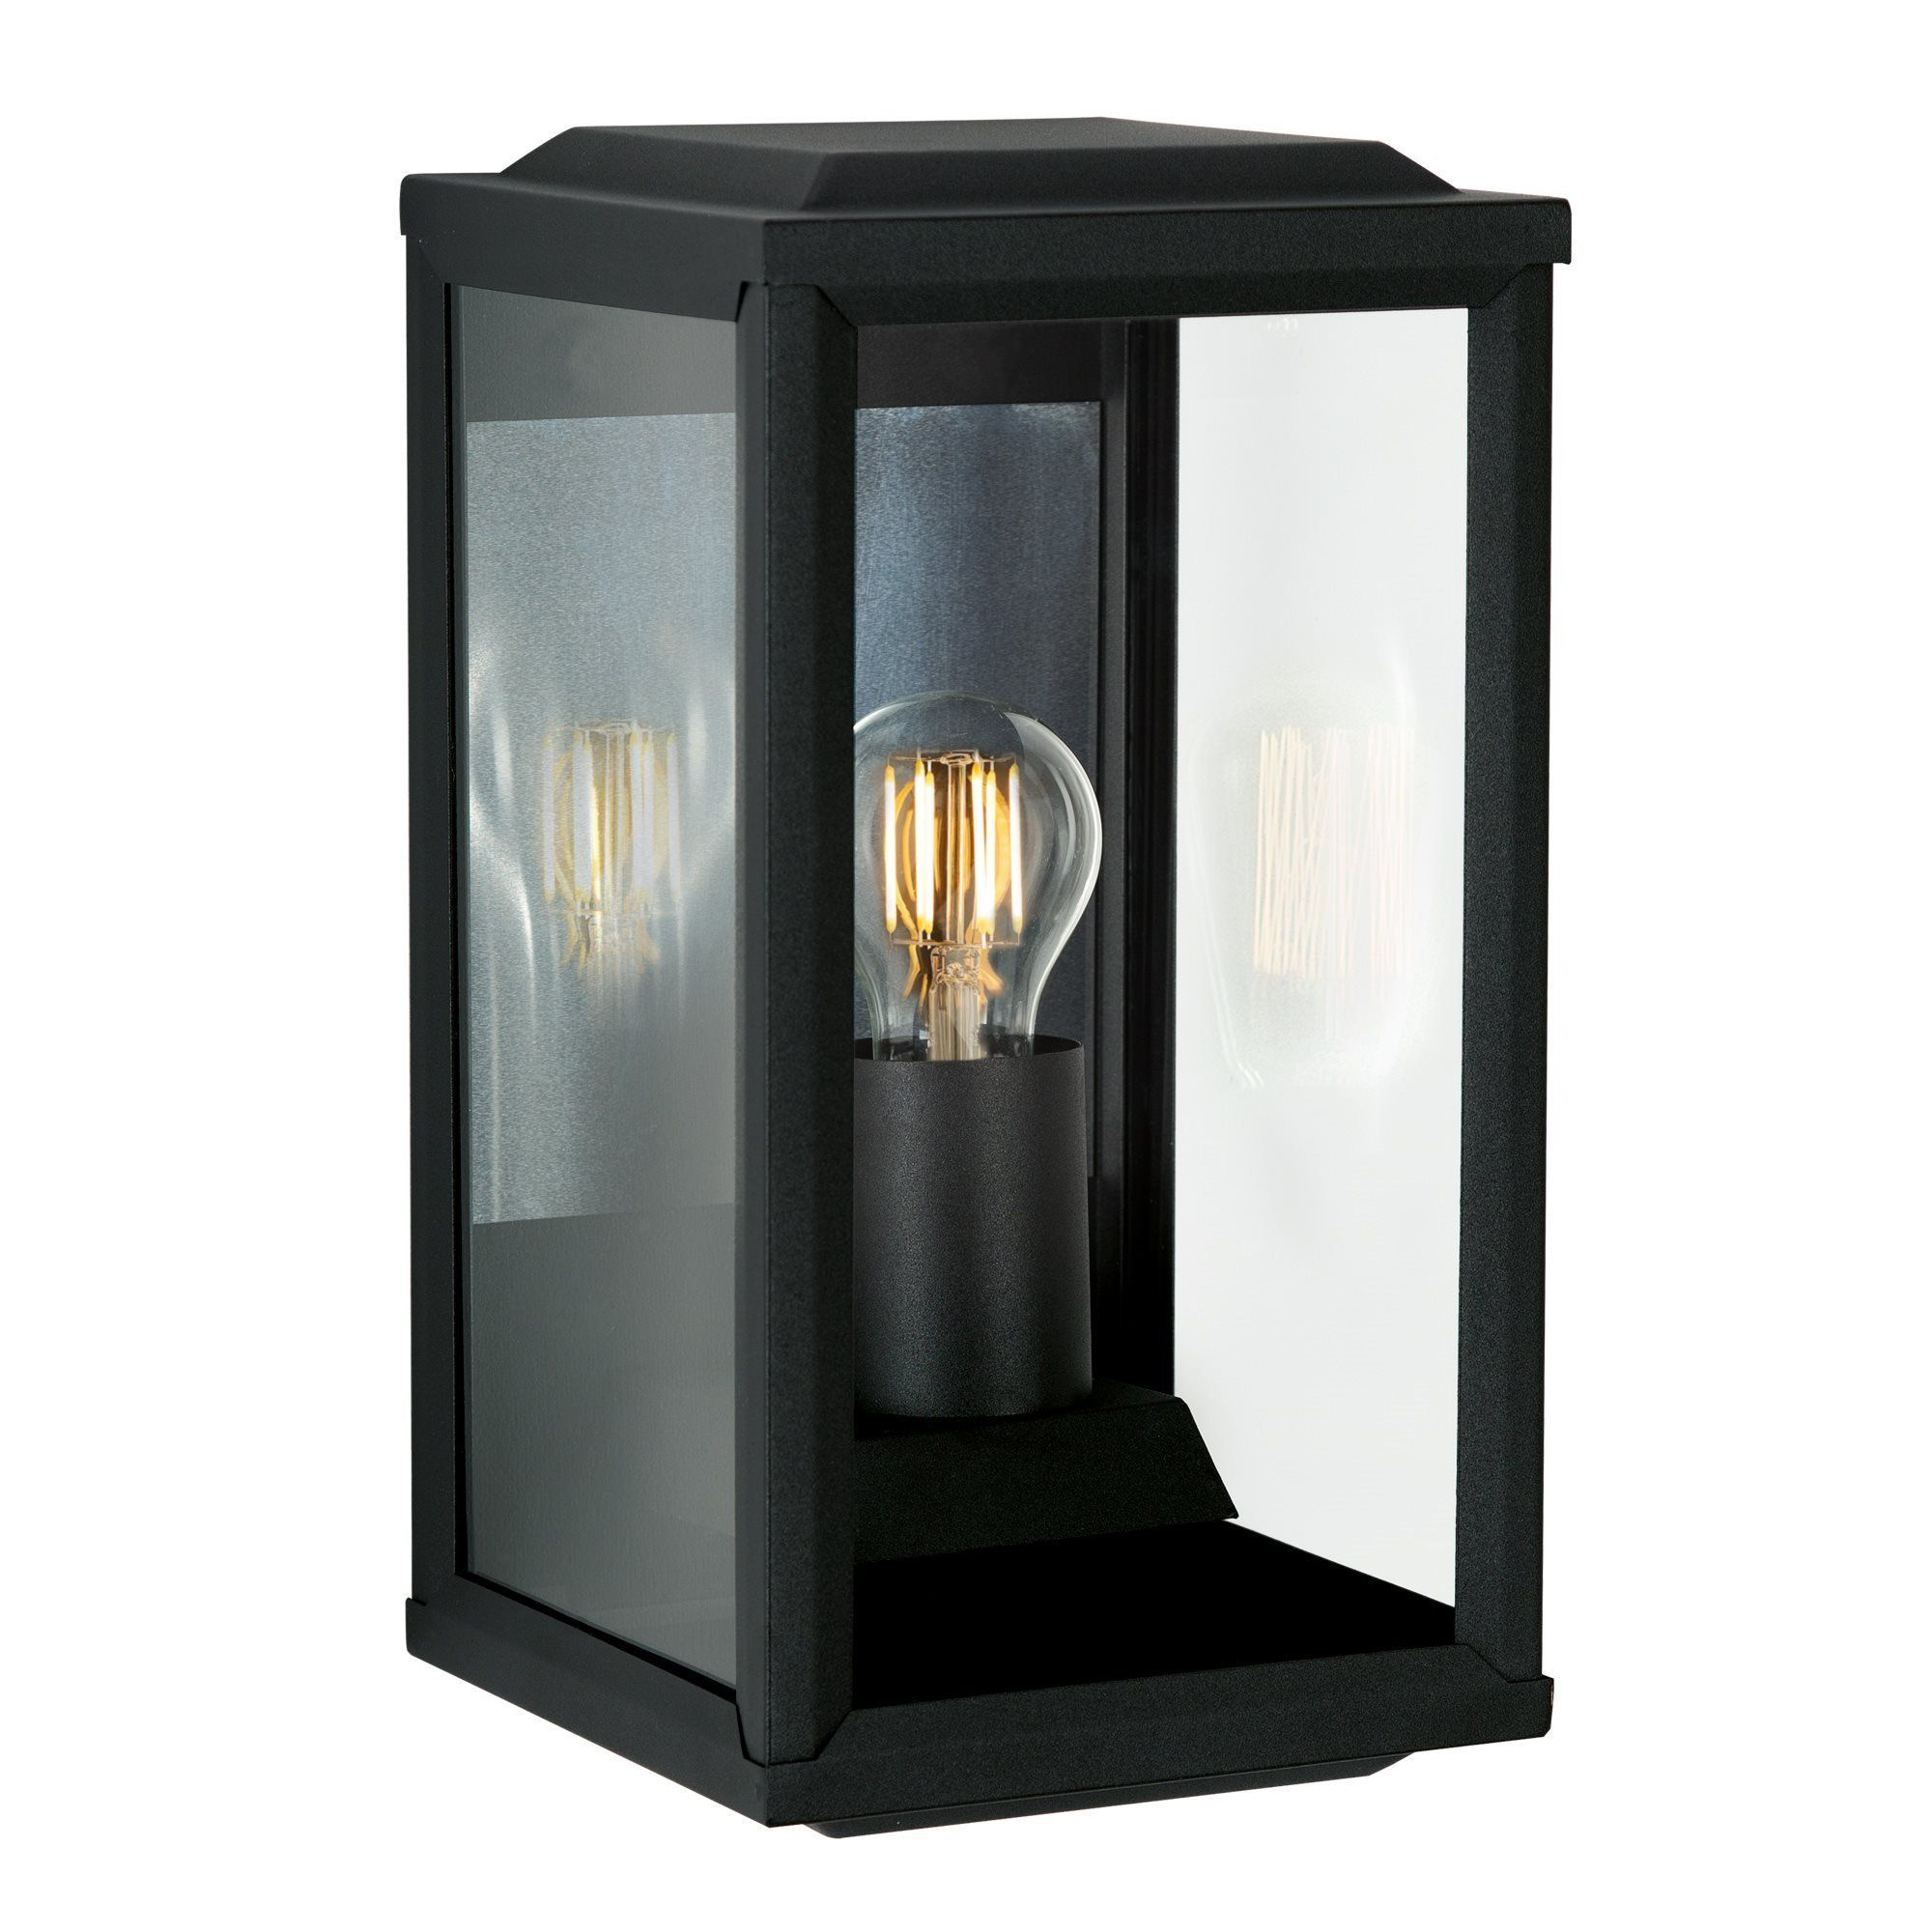 KS Verlichting buiten wandlamp Gooi Groot - zwart